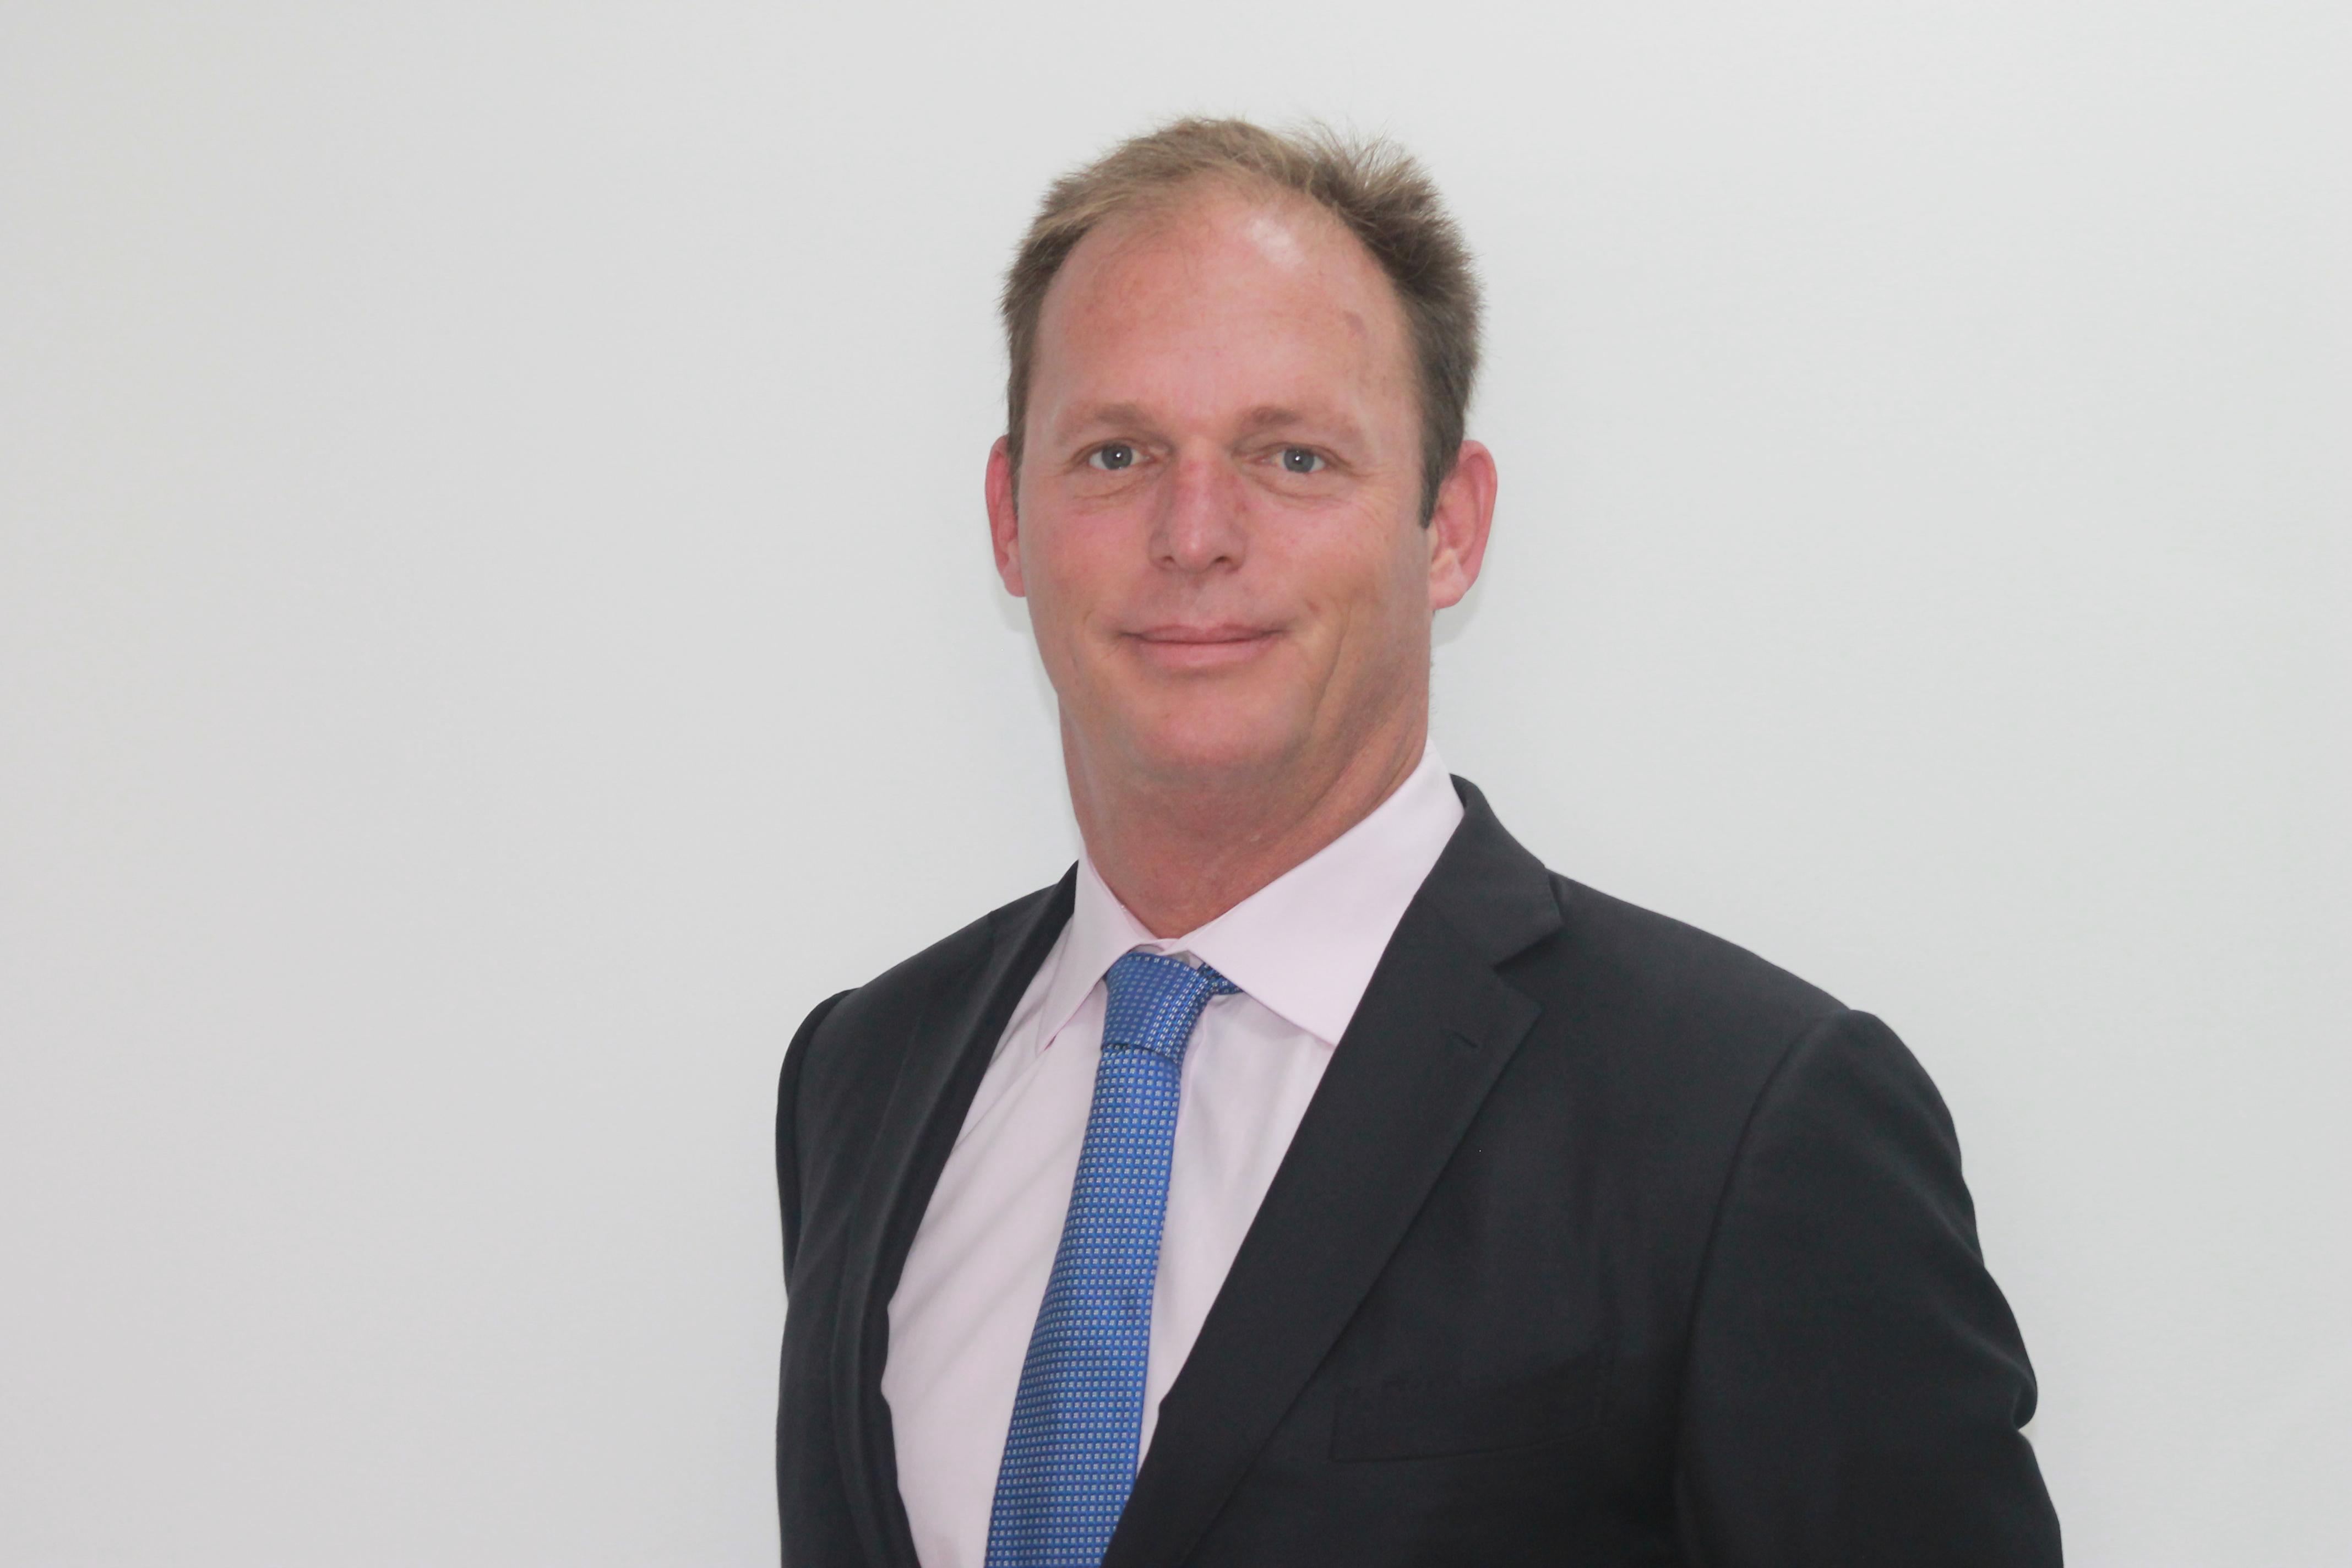 Paul Henri Schelfhout, administrador da Finangeste / Finangeste